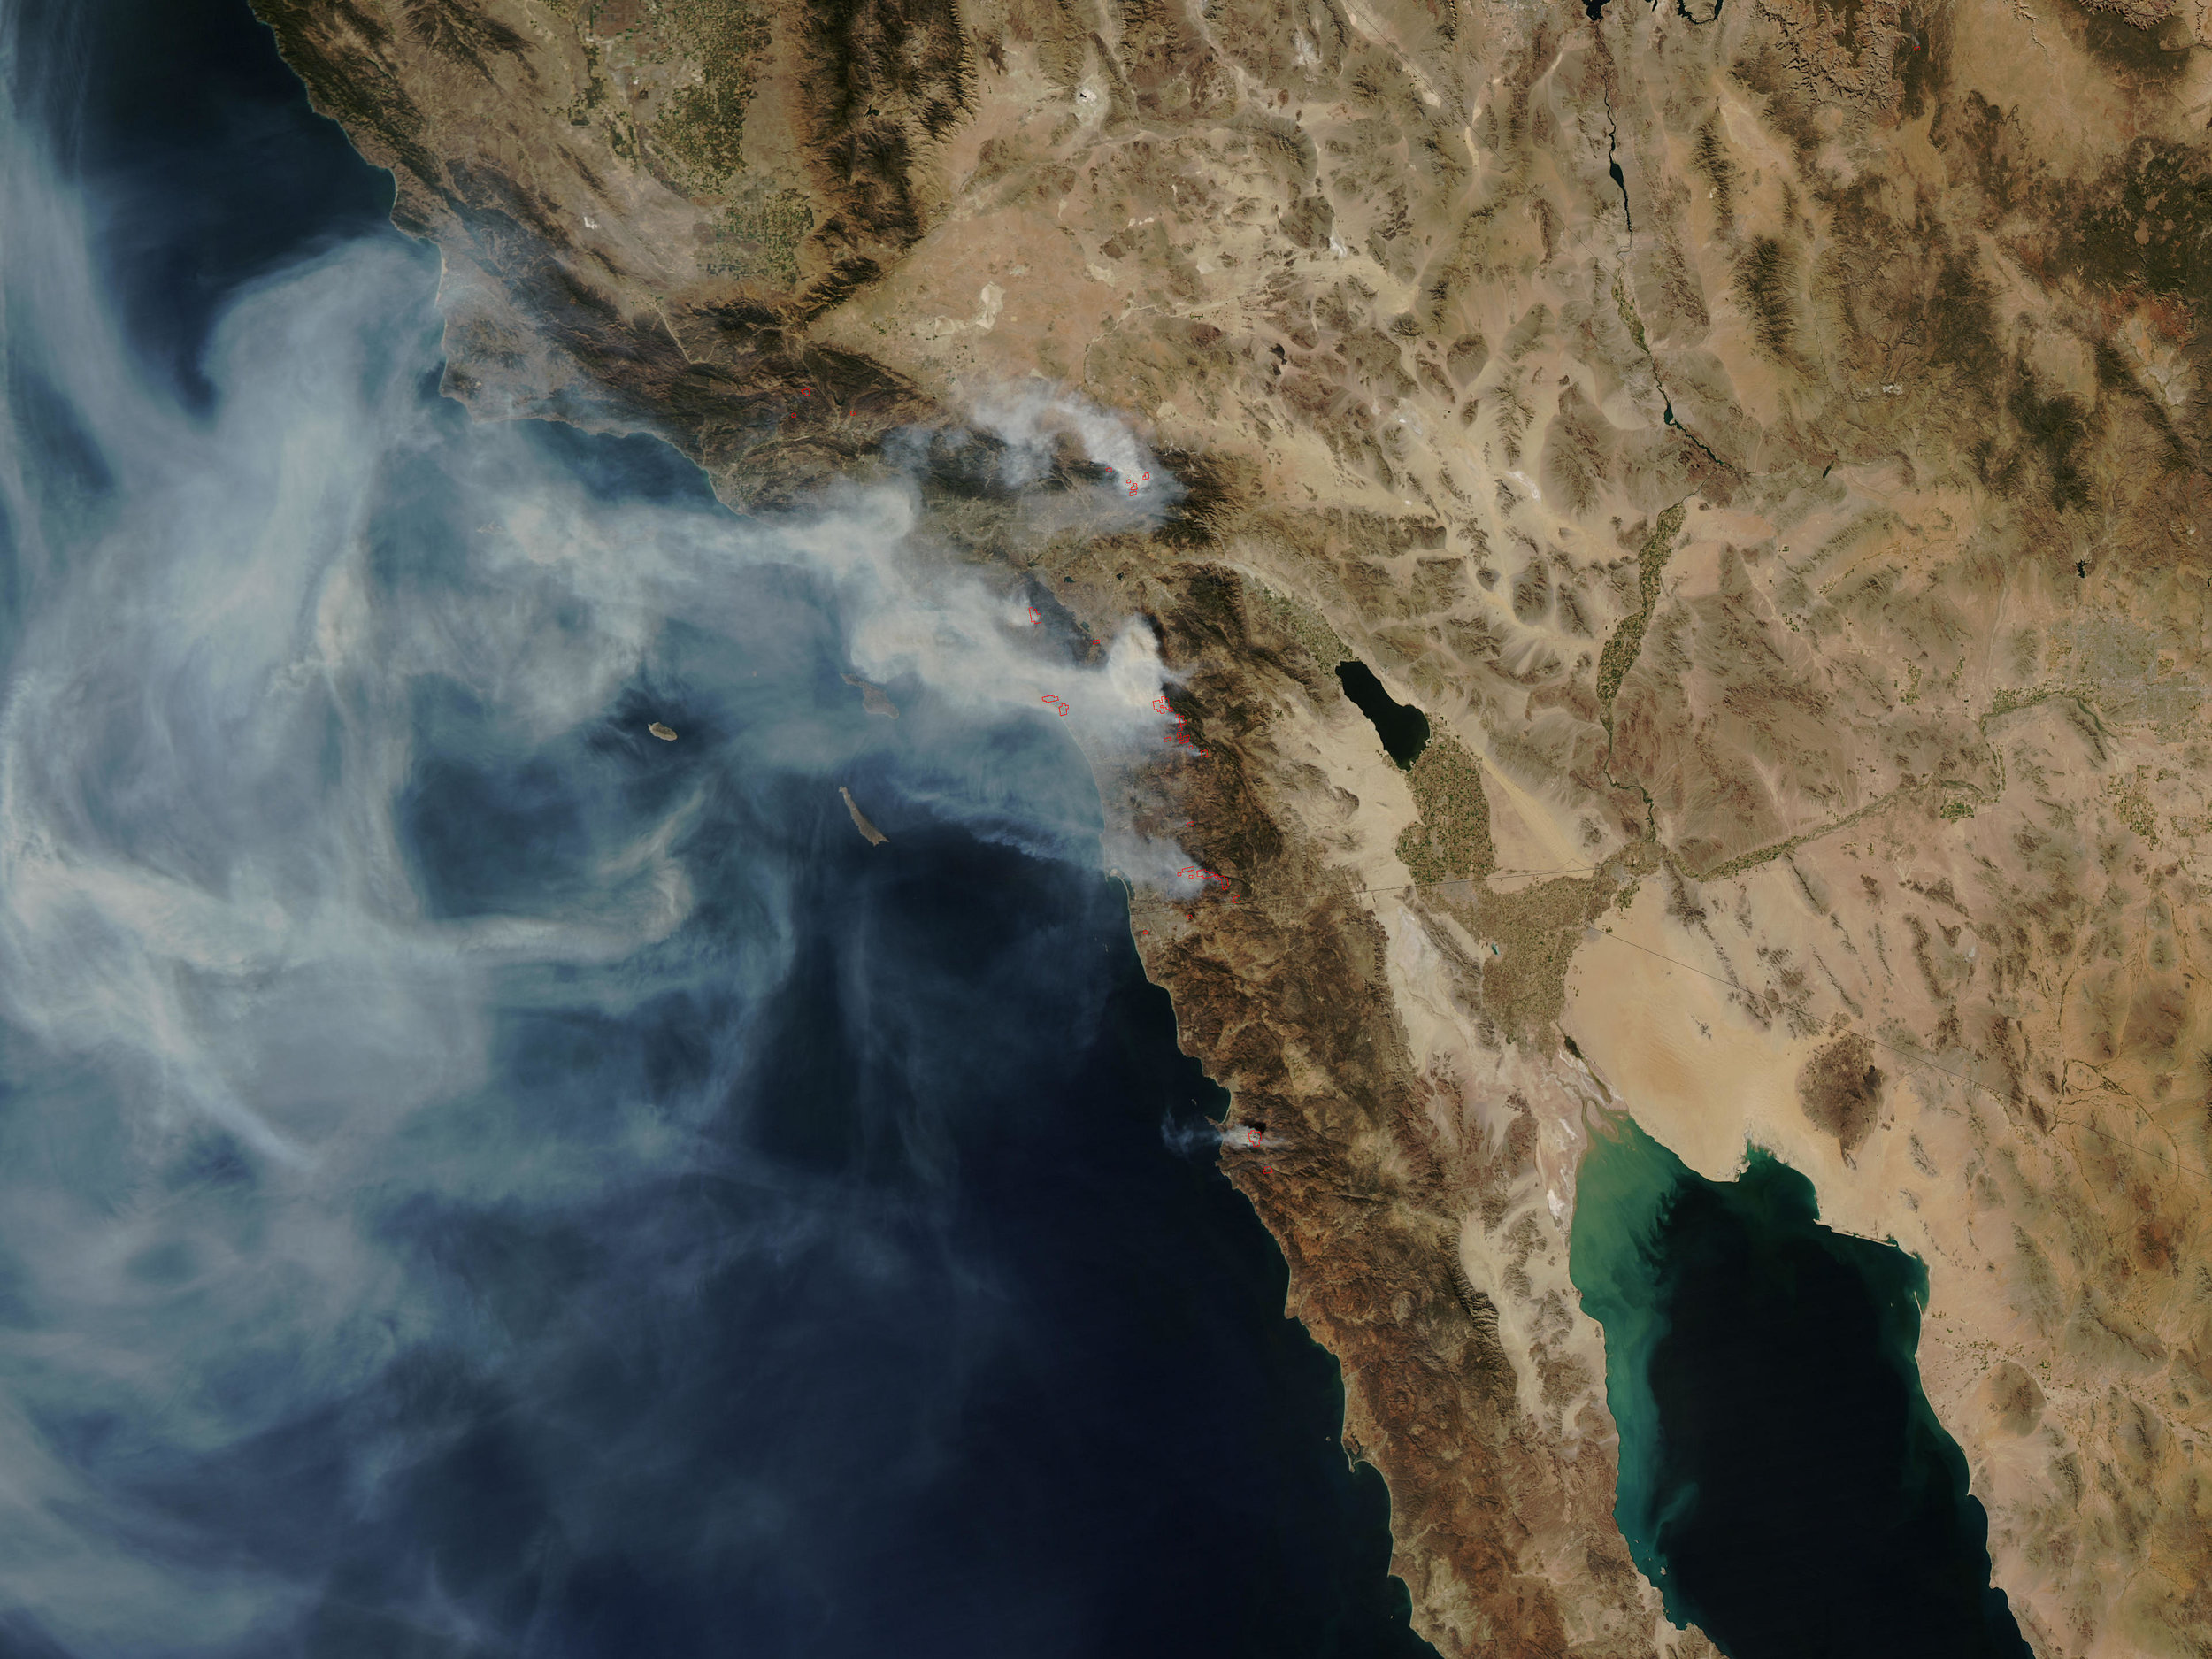 NASA image courtesy the  MODIS Rapid Response Team, Goddard Space Flight Center